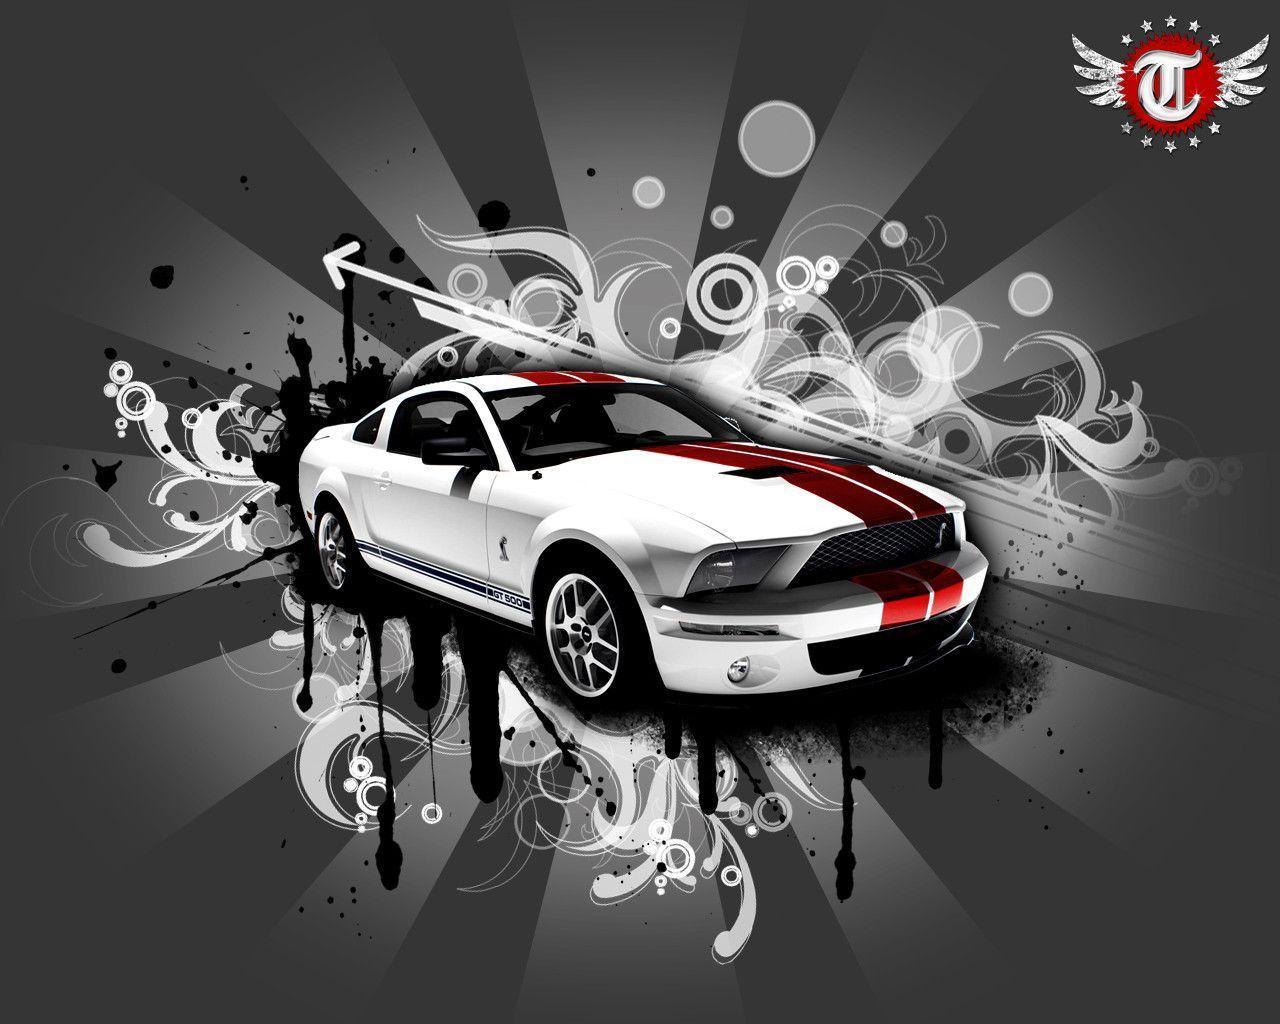 Mustang Wallpaper - mustangs Wallpaper (6411658) - Fanpop